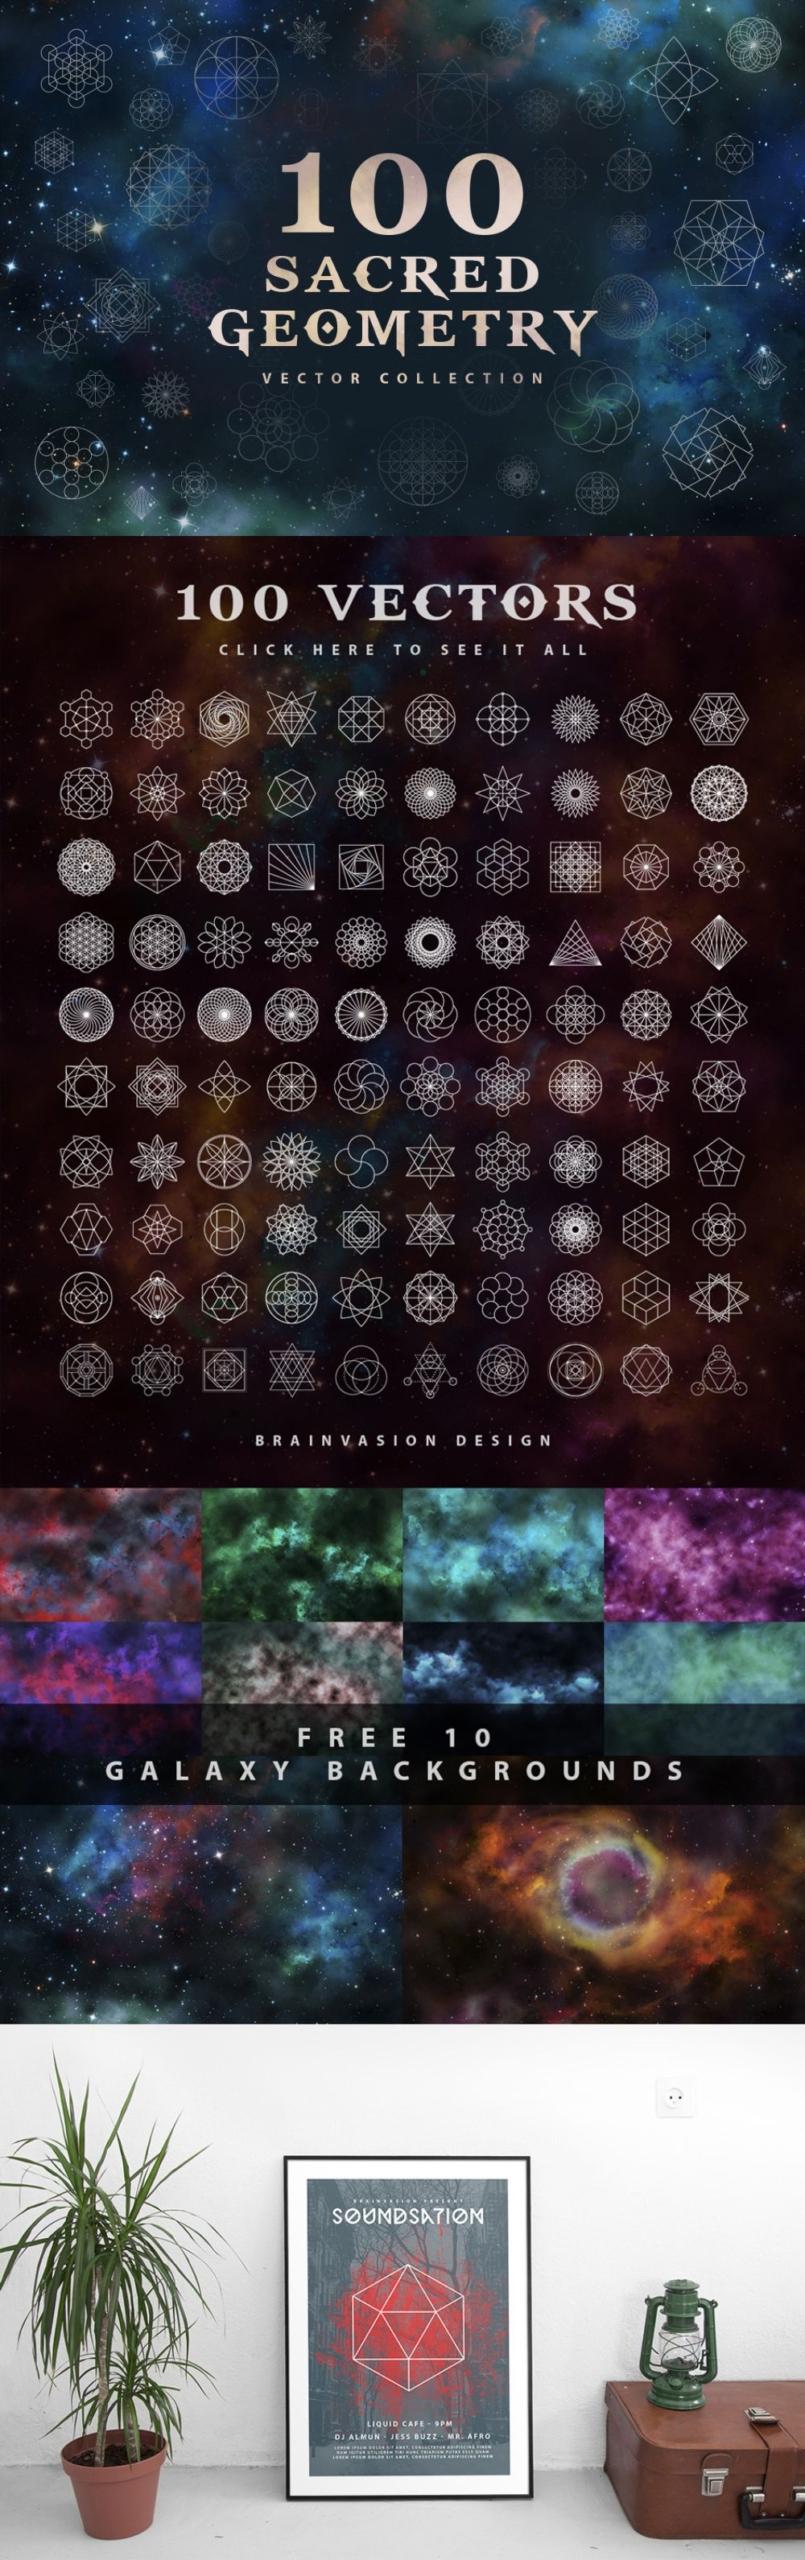 100 Sacred Geometry Vectors